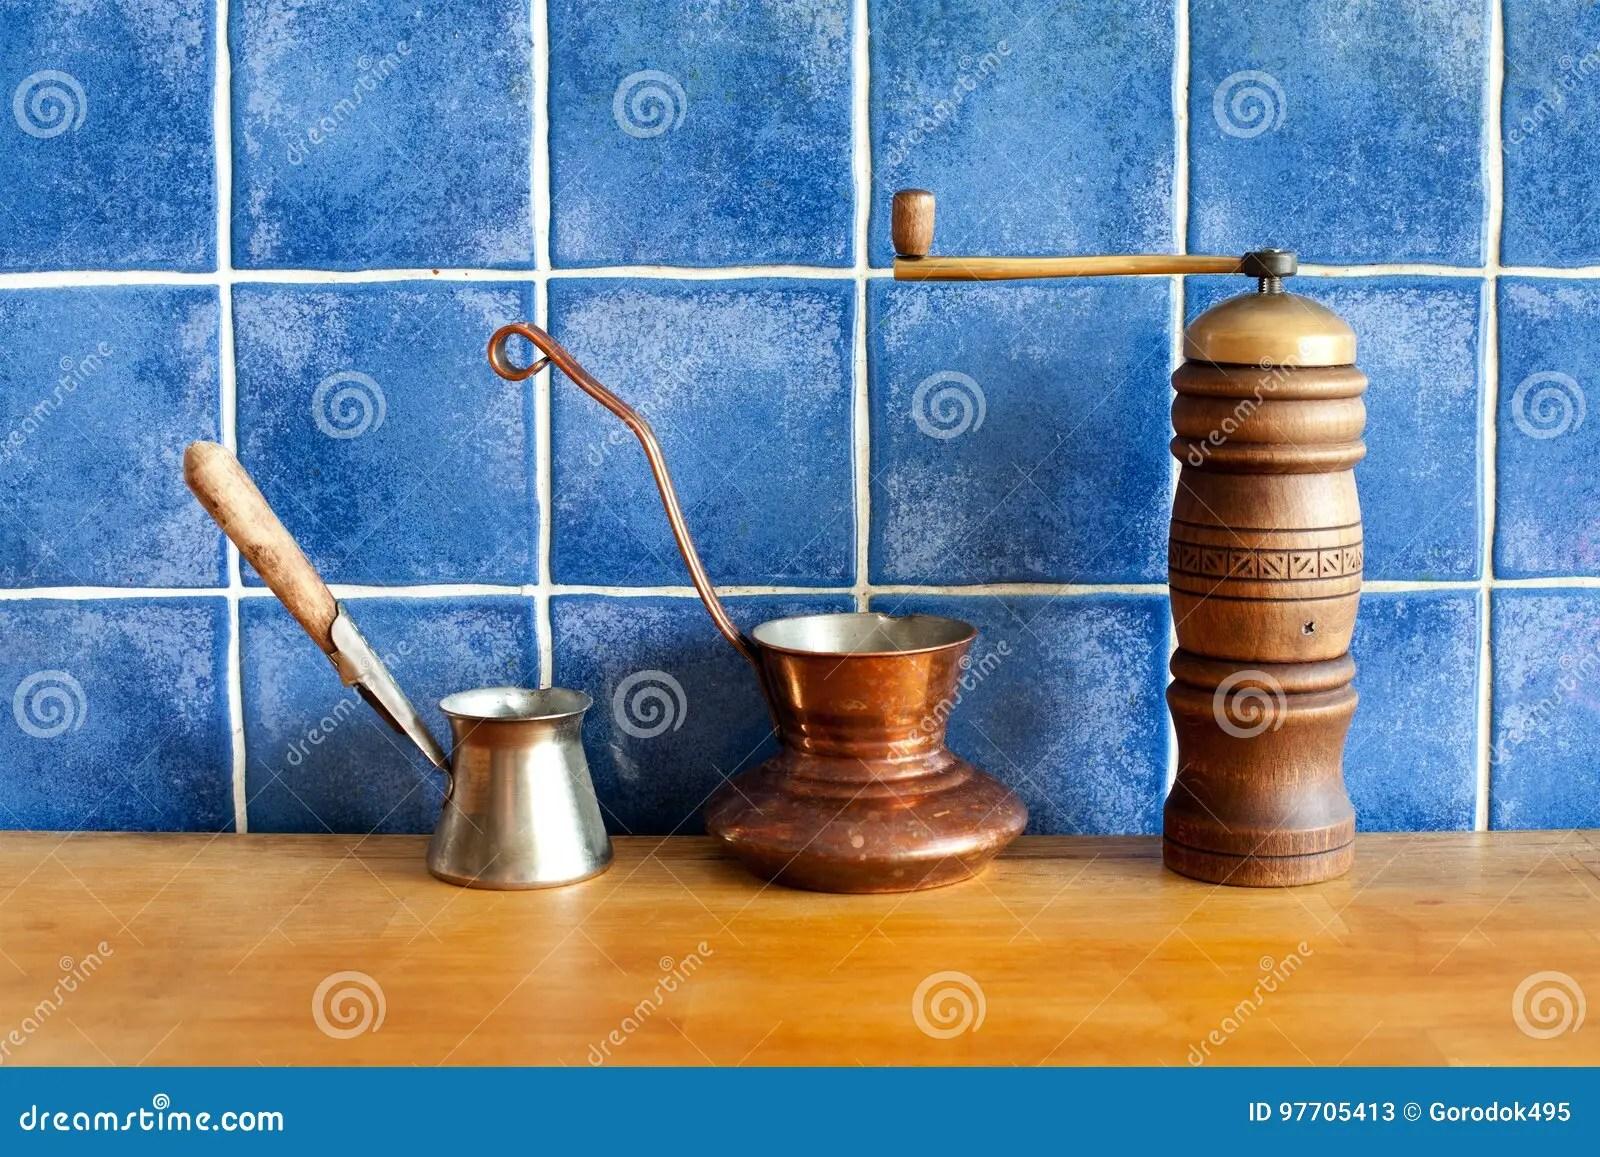 kitchen aid grinder cabinet refacing diy 传统土耳其咖啡cezve 在木桌 蓝色铺磁砖的背景上的减速火箭的研磨机磨 蓝色铺磁砖的背景